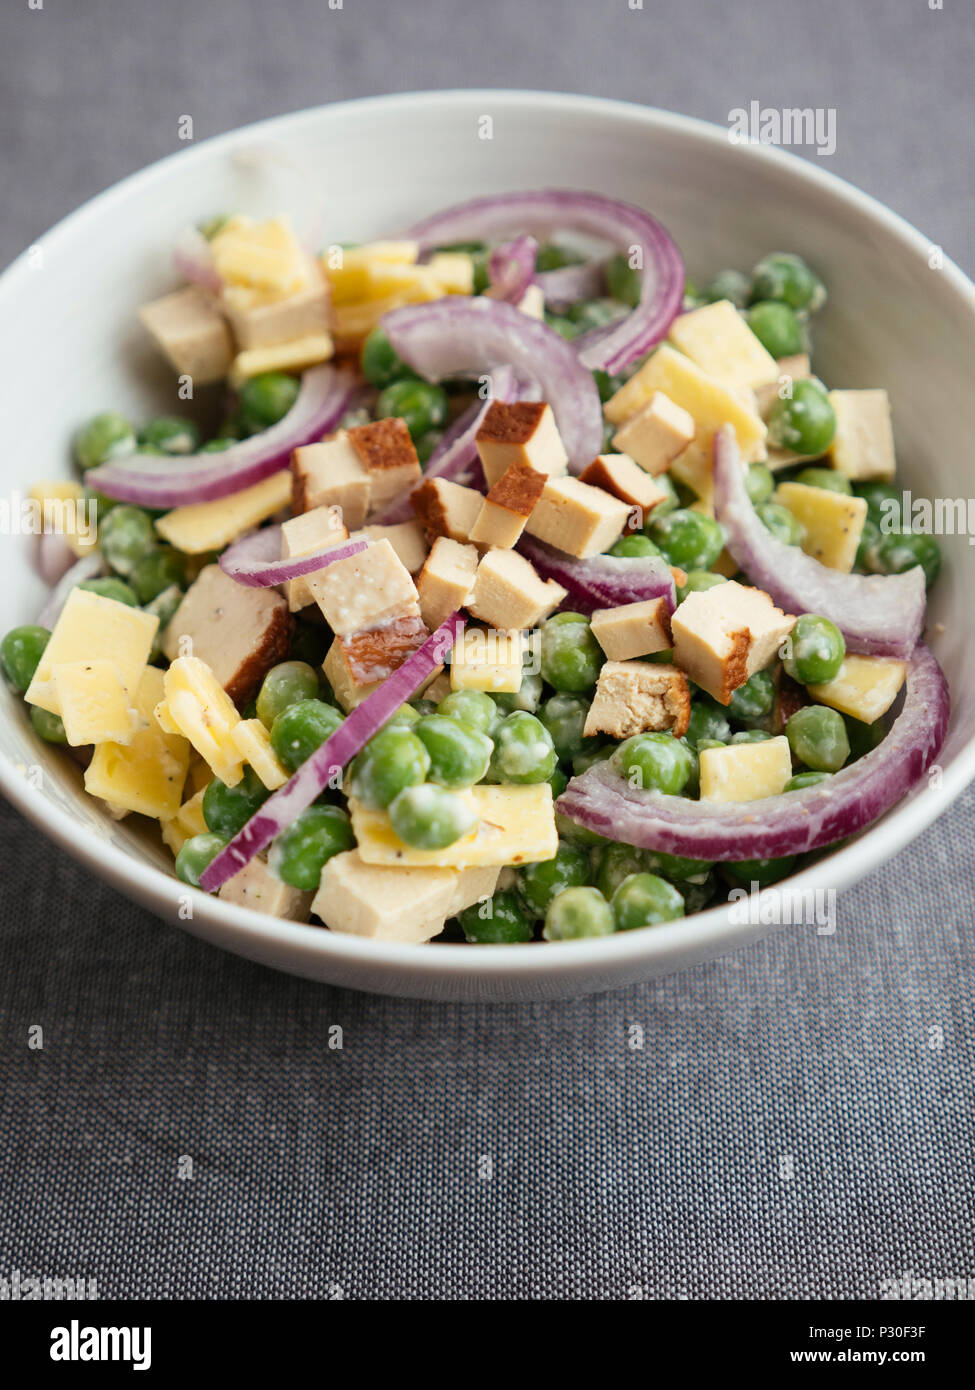 Vegan pea salad with tofu and vegan cheese - Stock Image